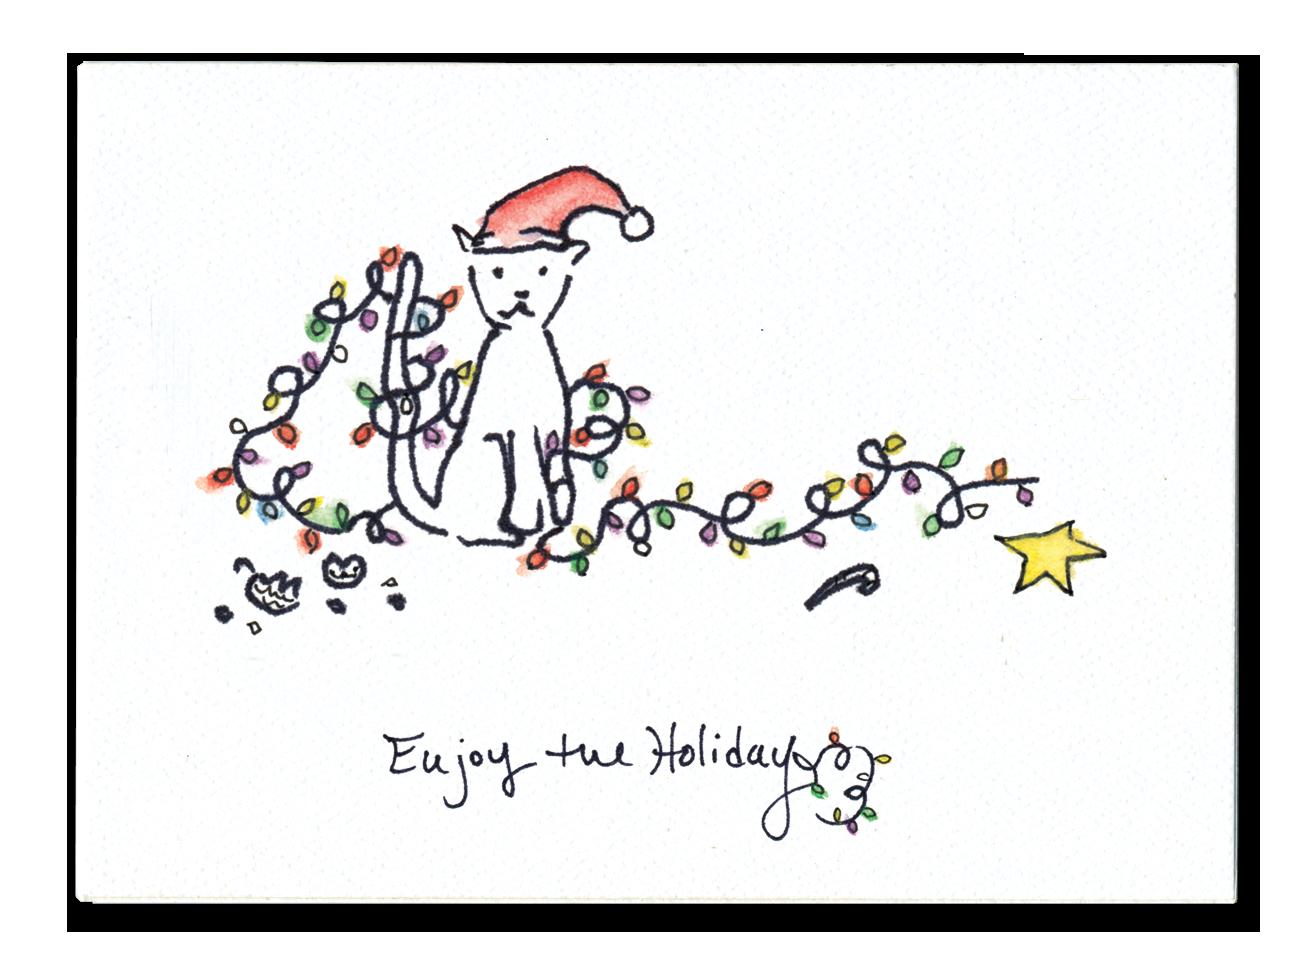 Enjoy the Holiday